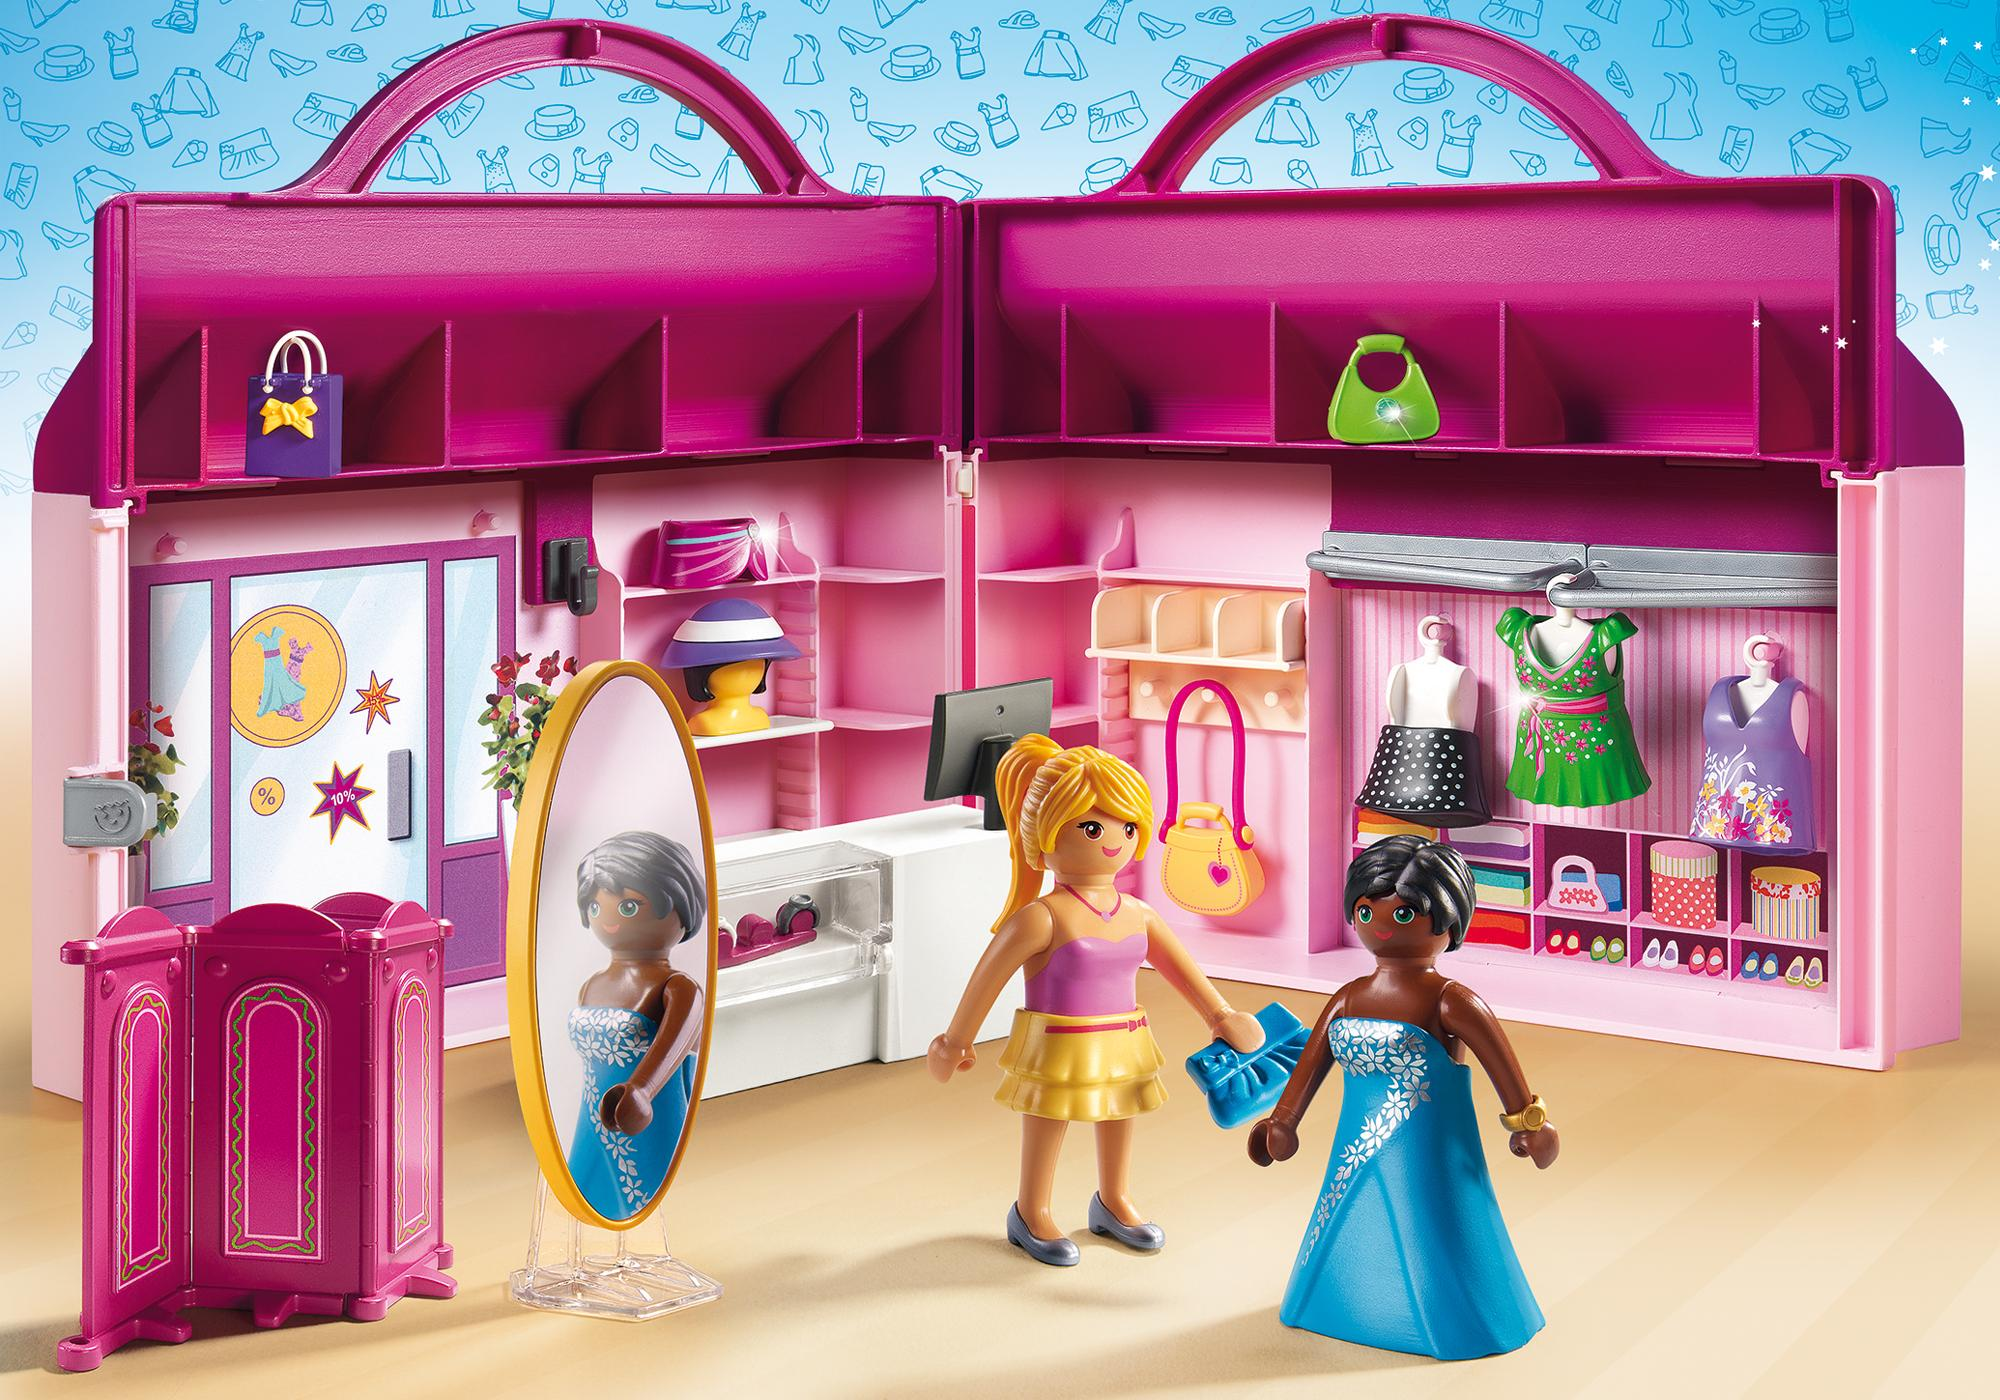 http://media.playmobil.com/i/playmobil/6862_product_detail/Tienda de Moda Maletín